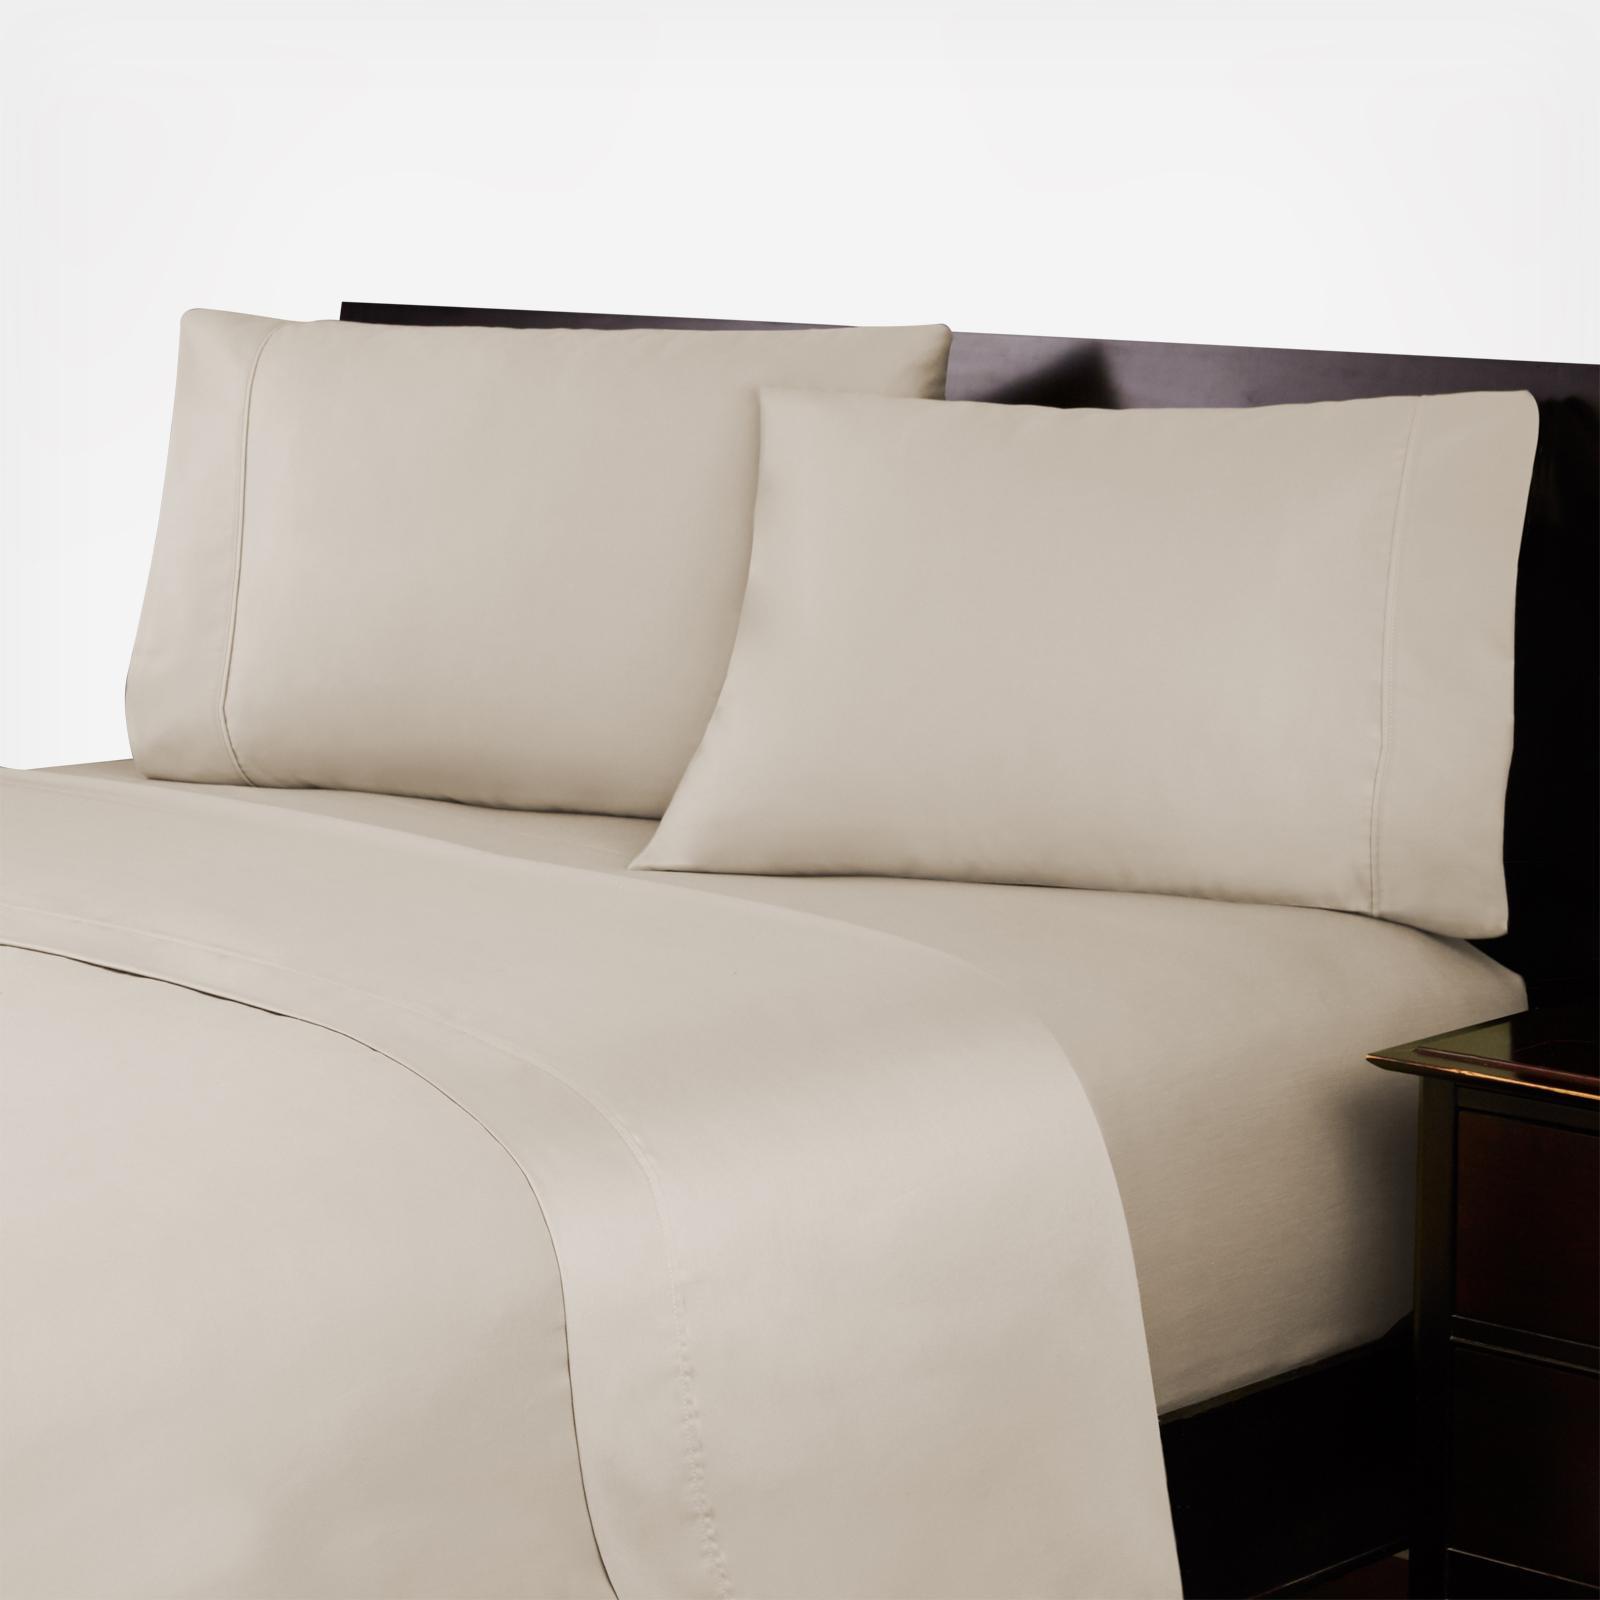 Amaze by welspun cotton sheet set bedding king navy blue - Amaze By Welspun Cotton Sheet Set Bedding King Navy Blue 4